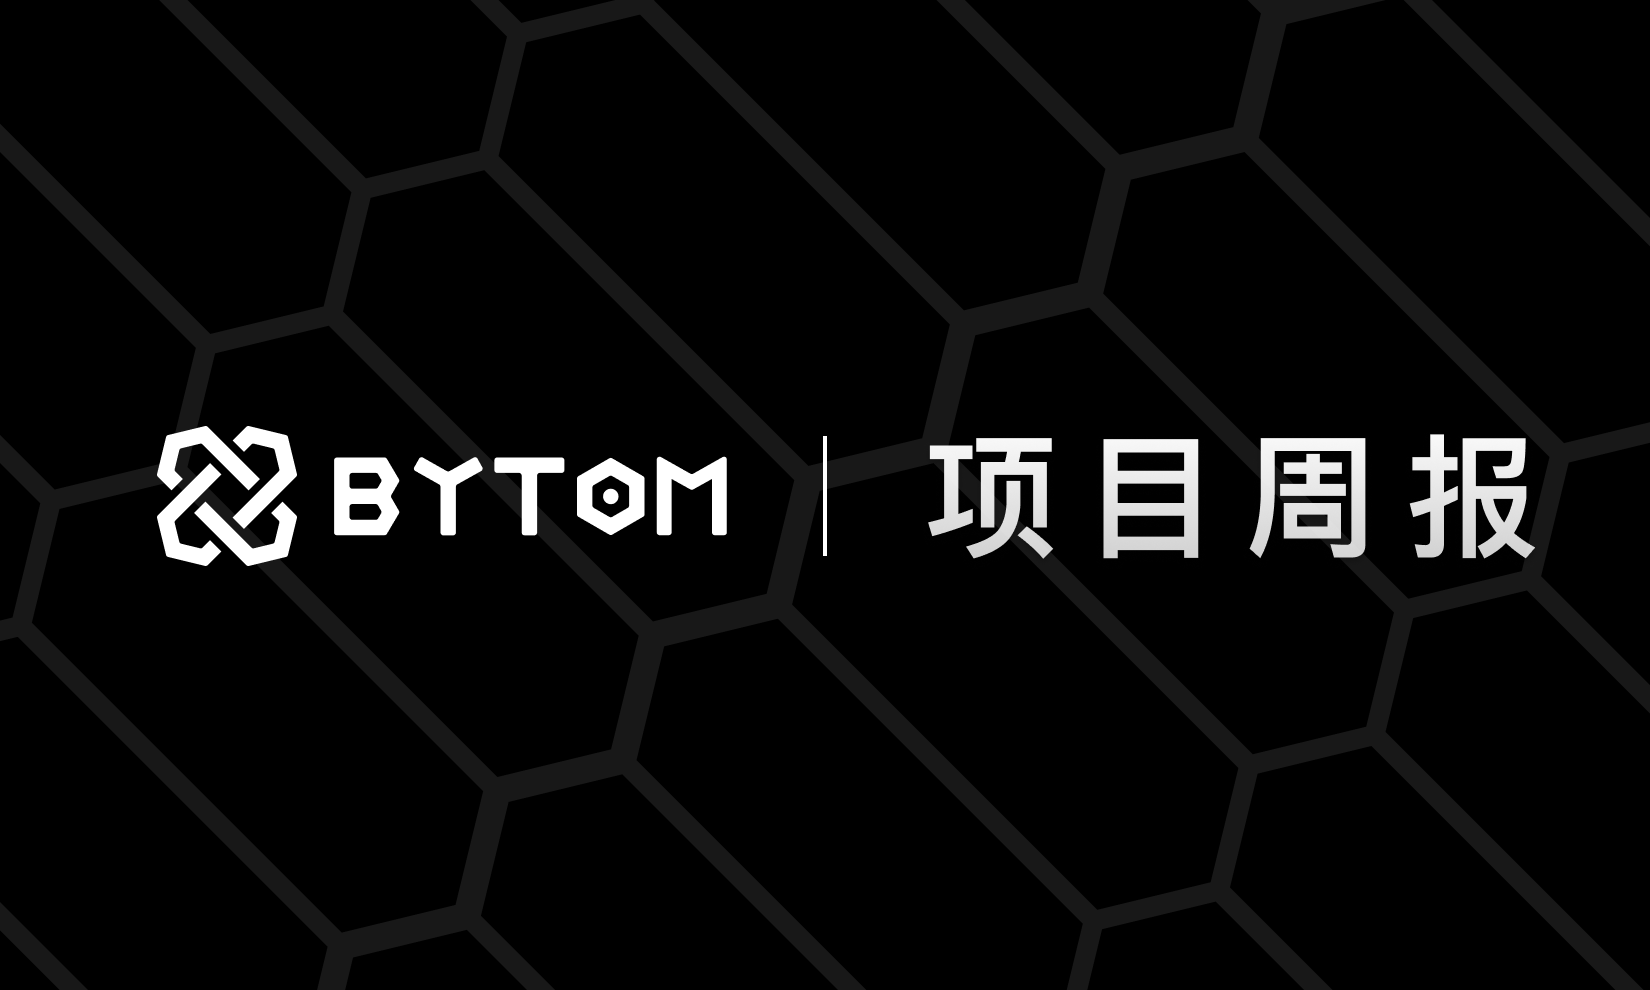 Bytom2.0全网共识节点运行即将升级丨比原链项目周报(第210期)